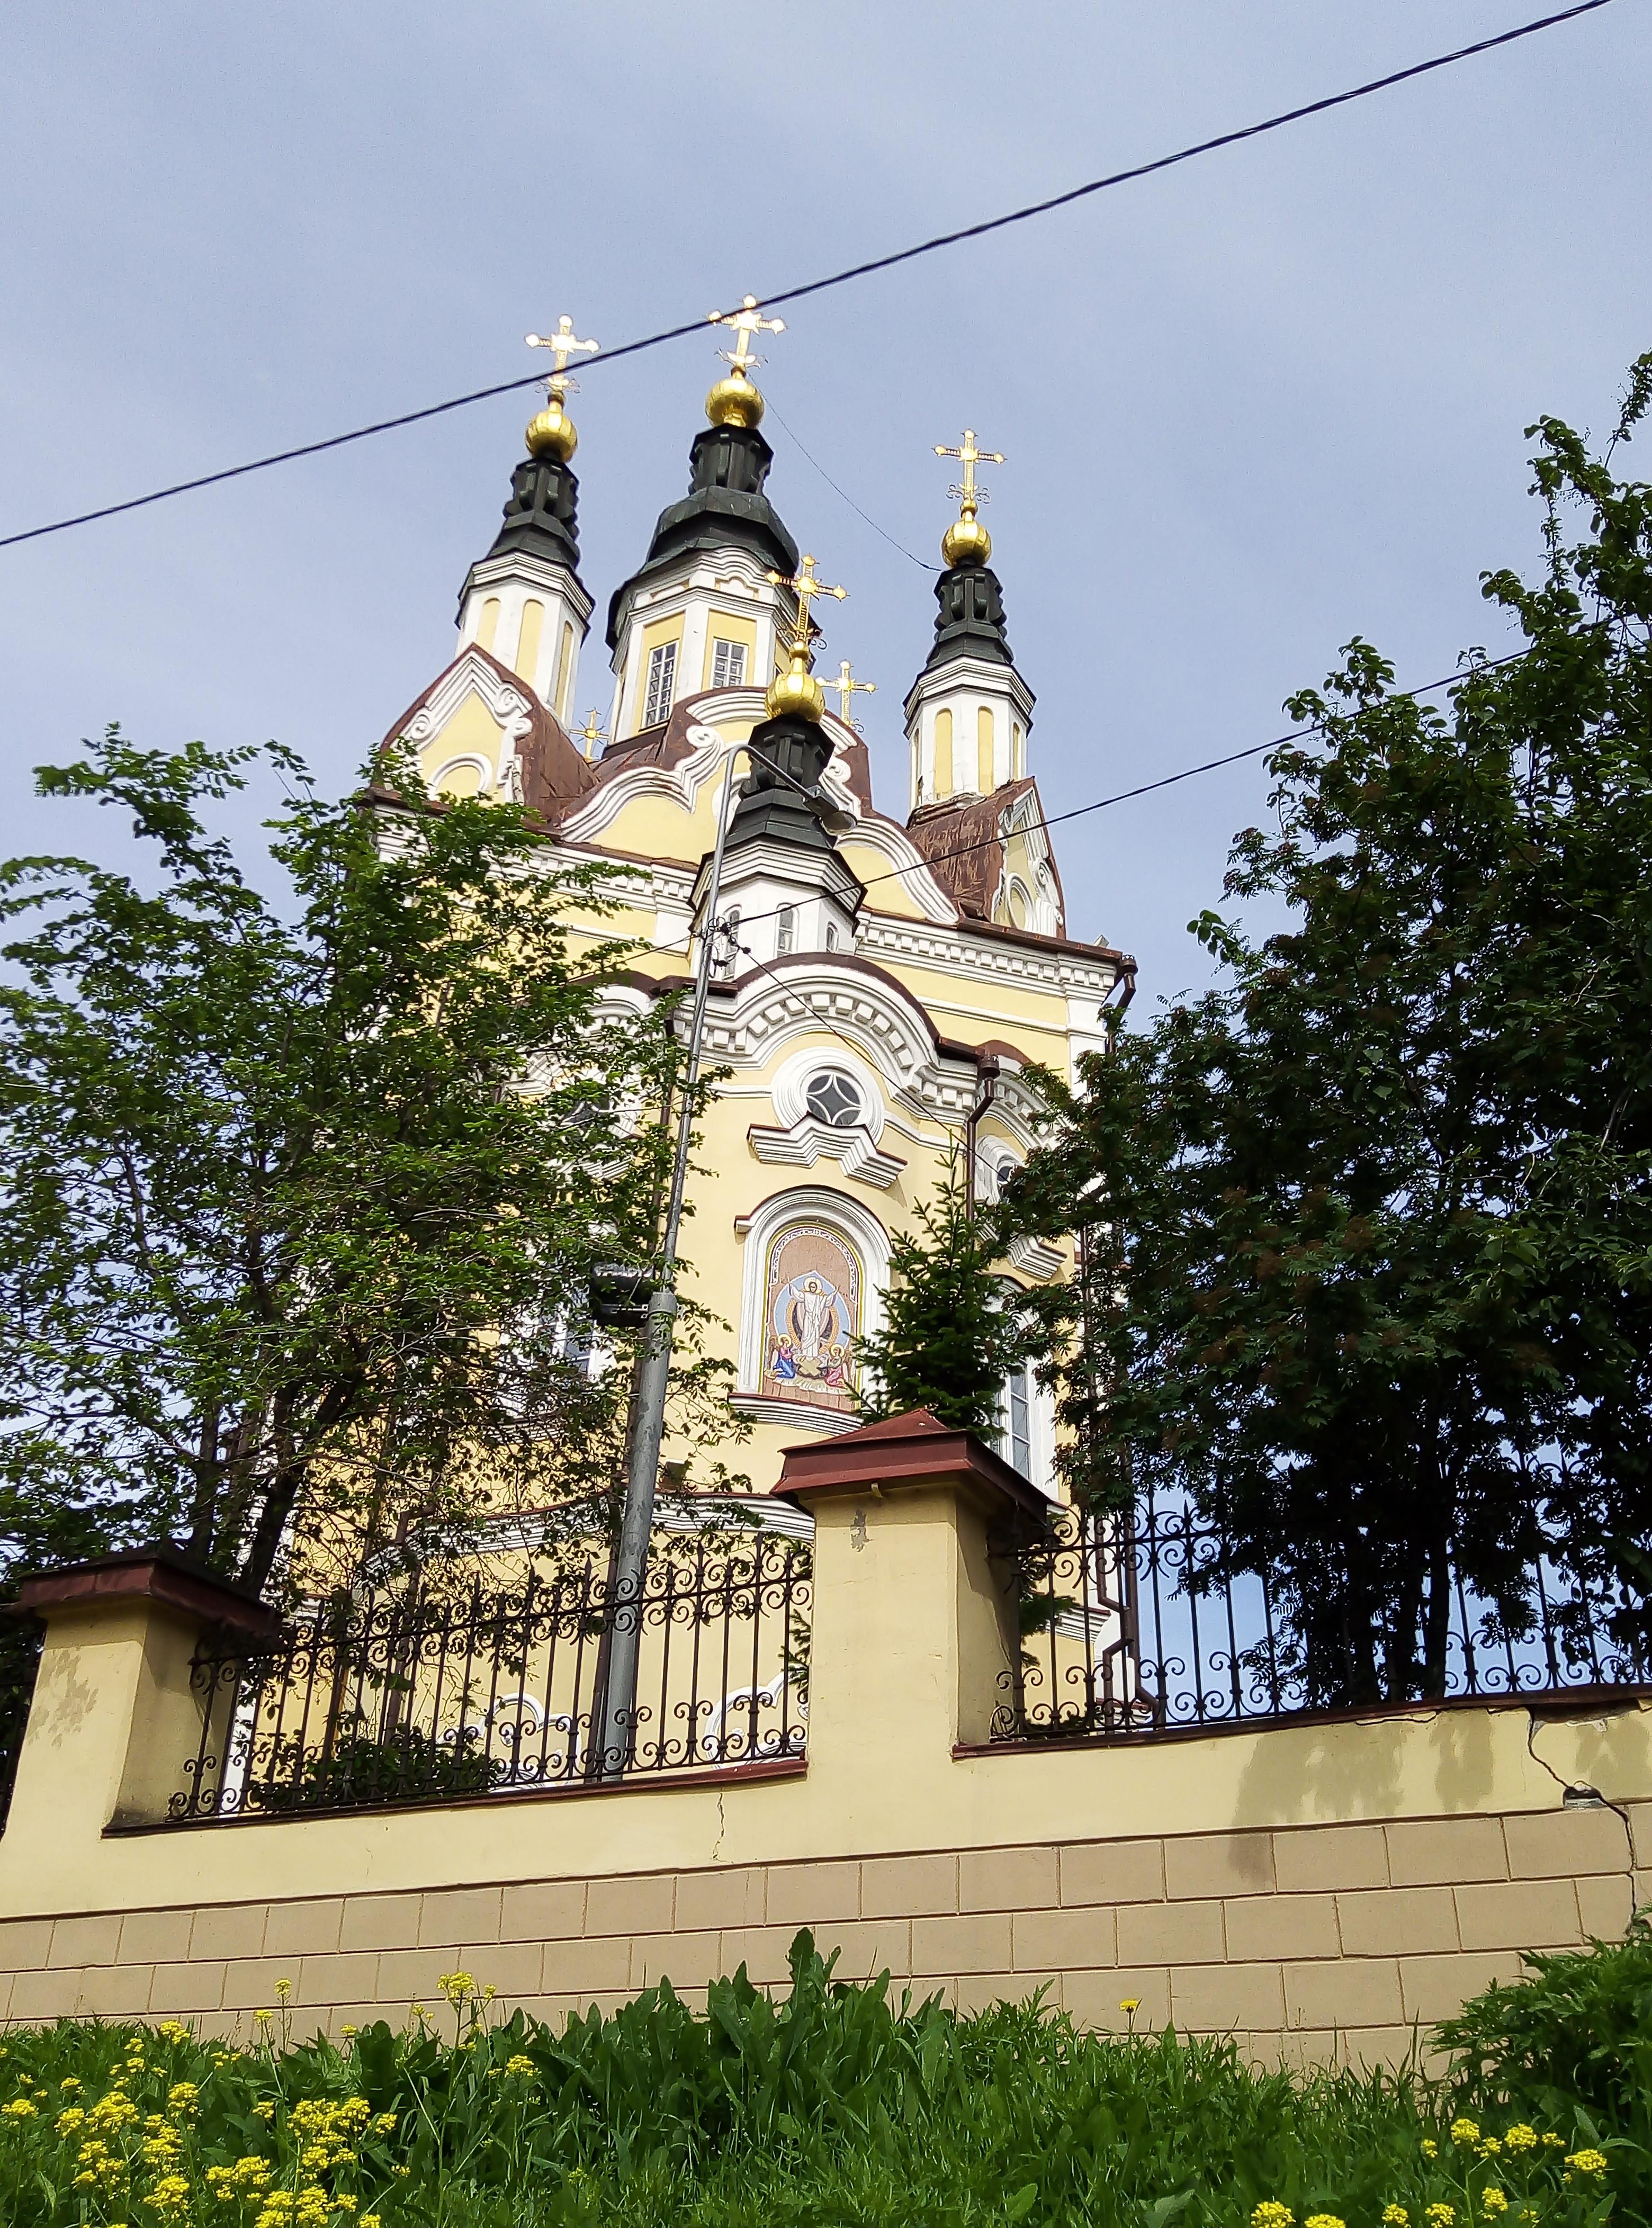 2019 06 25 10 20 46 - Rússia-Tomsk e as igrejas